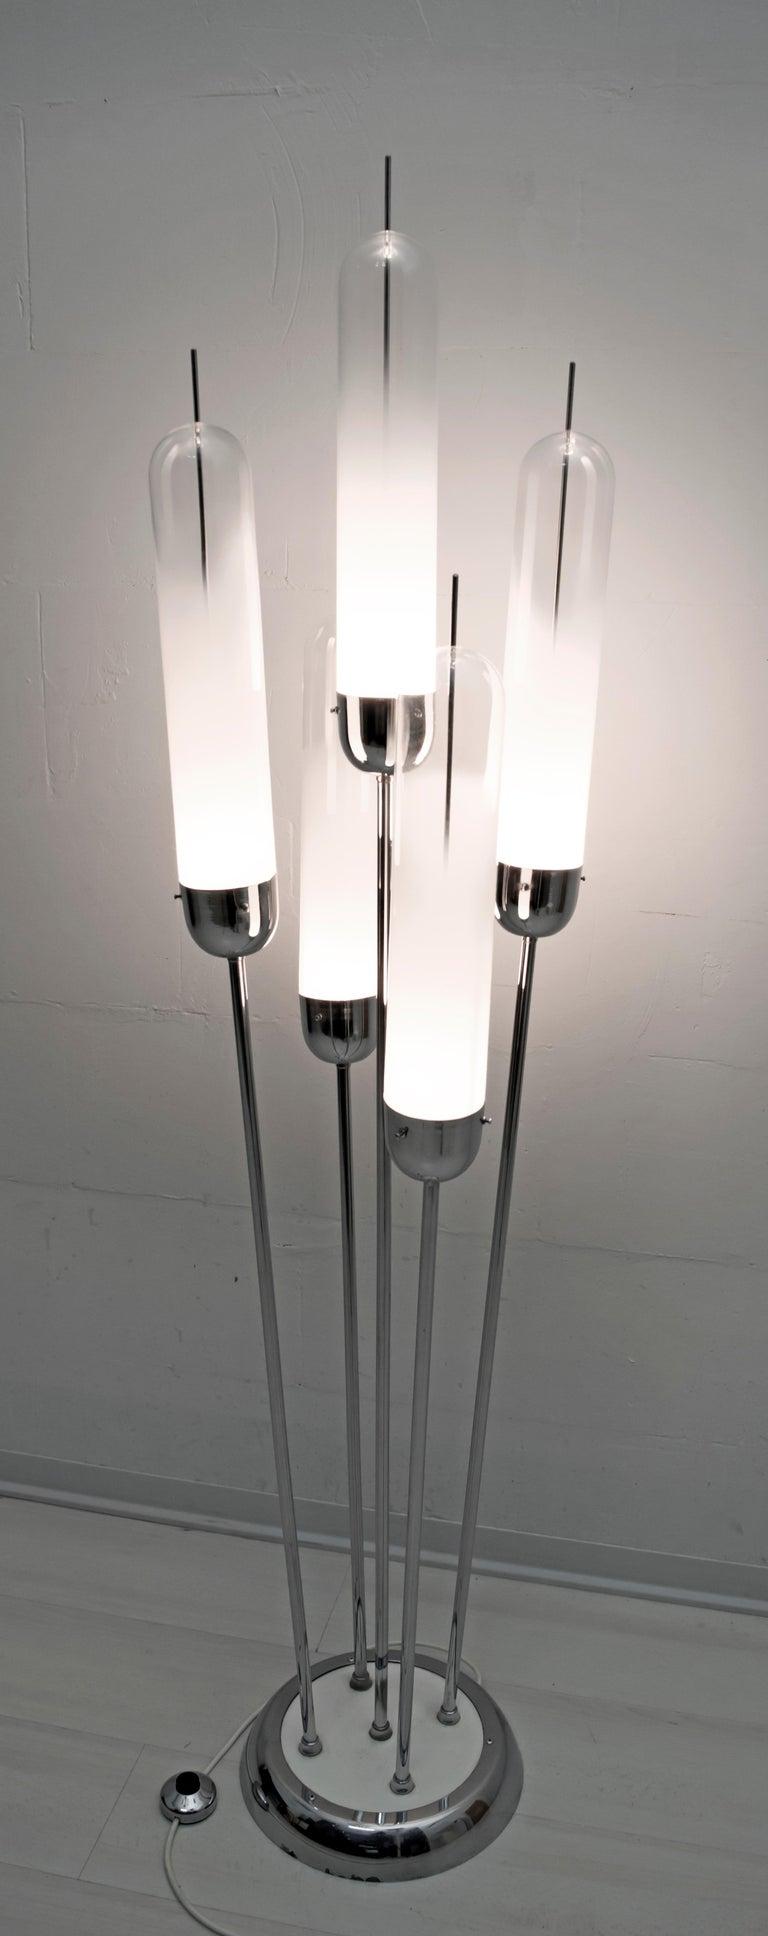 Carlo Nason Mid-Century Modern Floor Lamp Blown Glass for Mazzega, 1970s In Good Condition For Sale In Cerignola, Italy Puglia